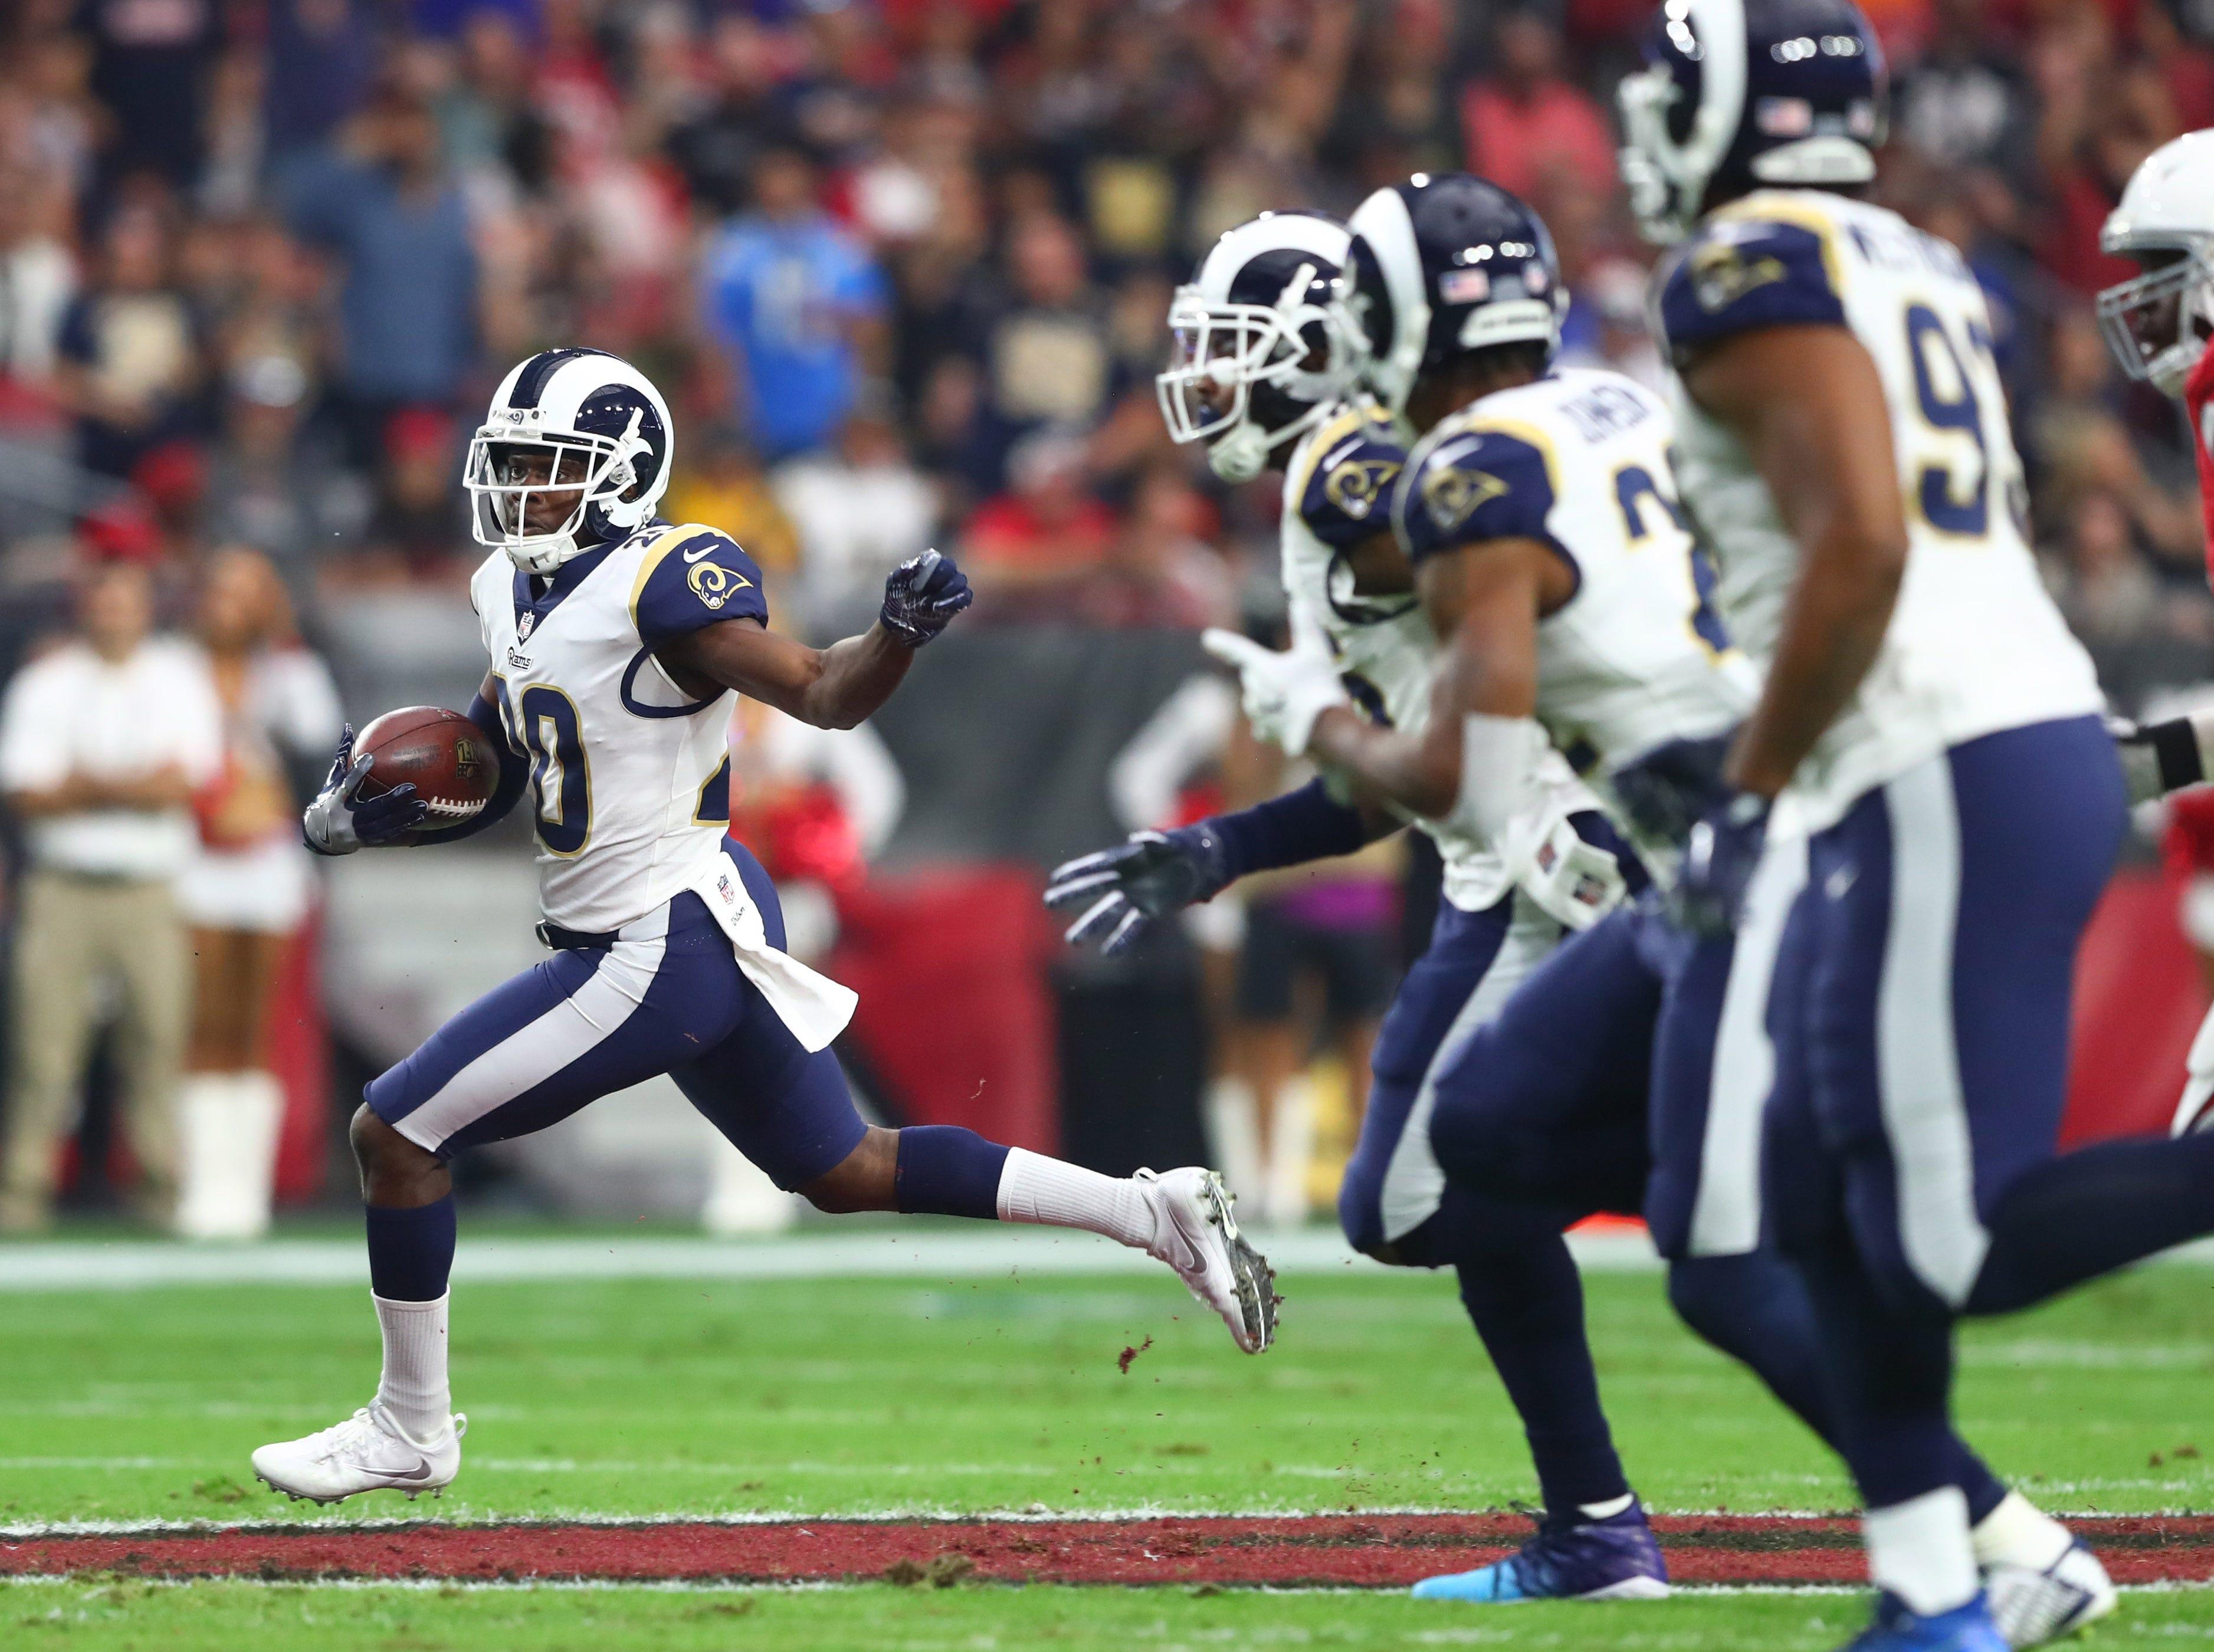 Dec 3, 2017; Glendale, AZ, USA; Los Angeles Rams safety Lamarcus Joyner returns a first quarter interception against the Arizona Cardinals at University of Phoenix Stadium. Mandatory Credit: Mark J. Rebilas-USA TODAY Sports